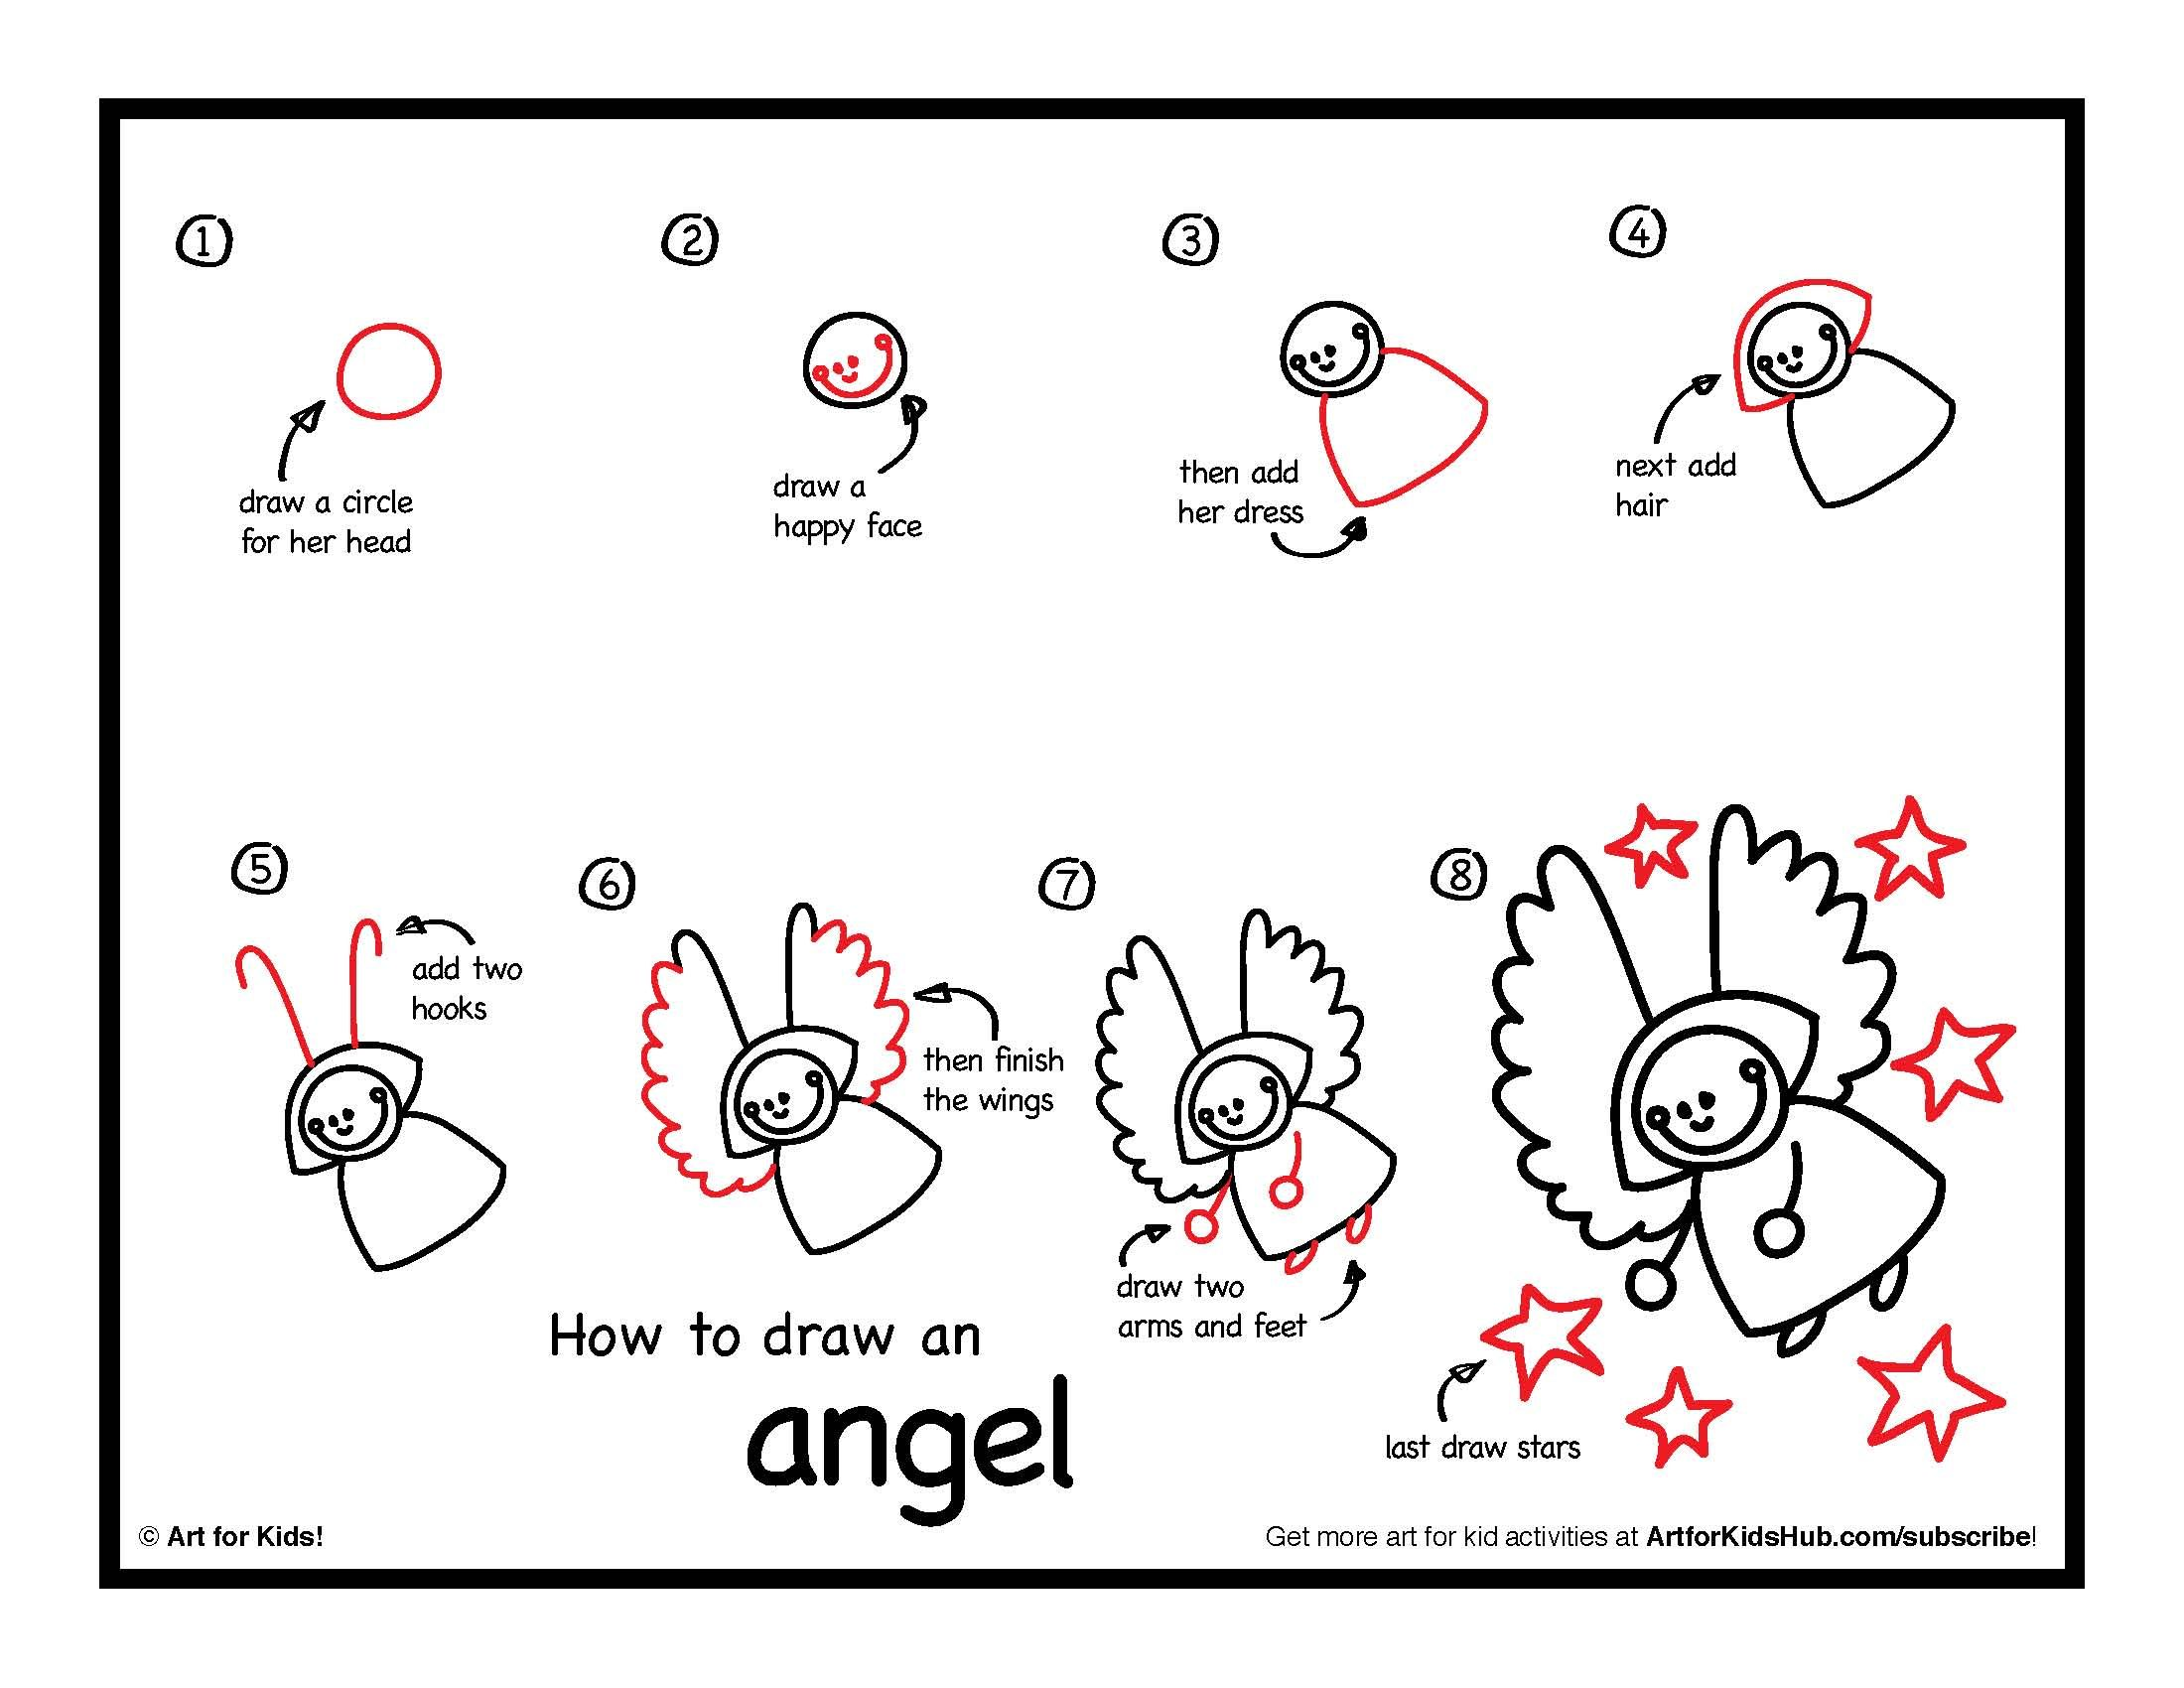 How To Draw An Angel Art For Kids Hub Art For Kids Hub